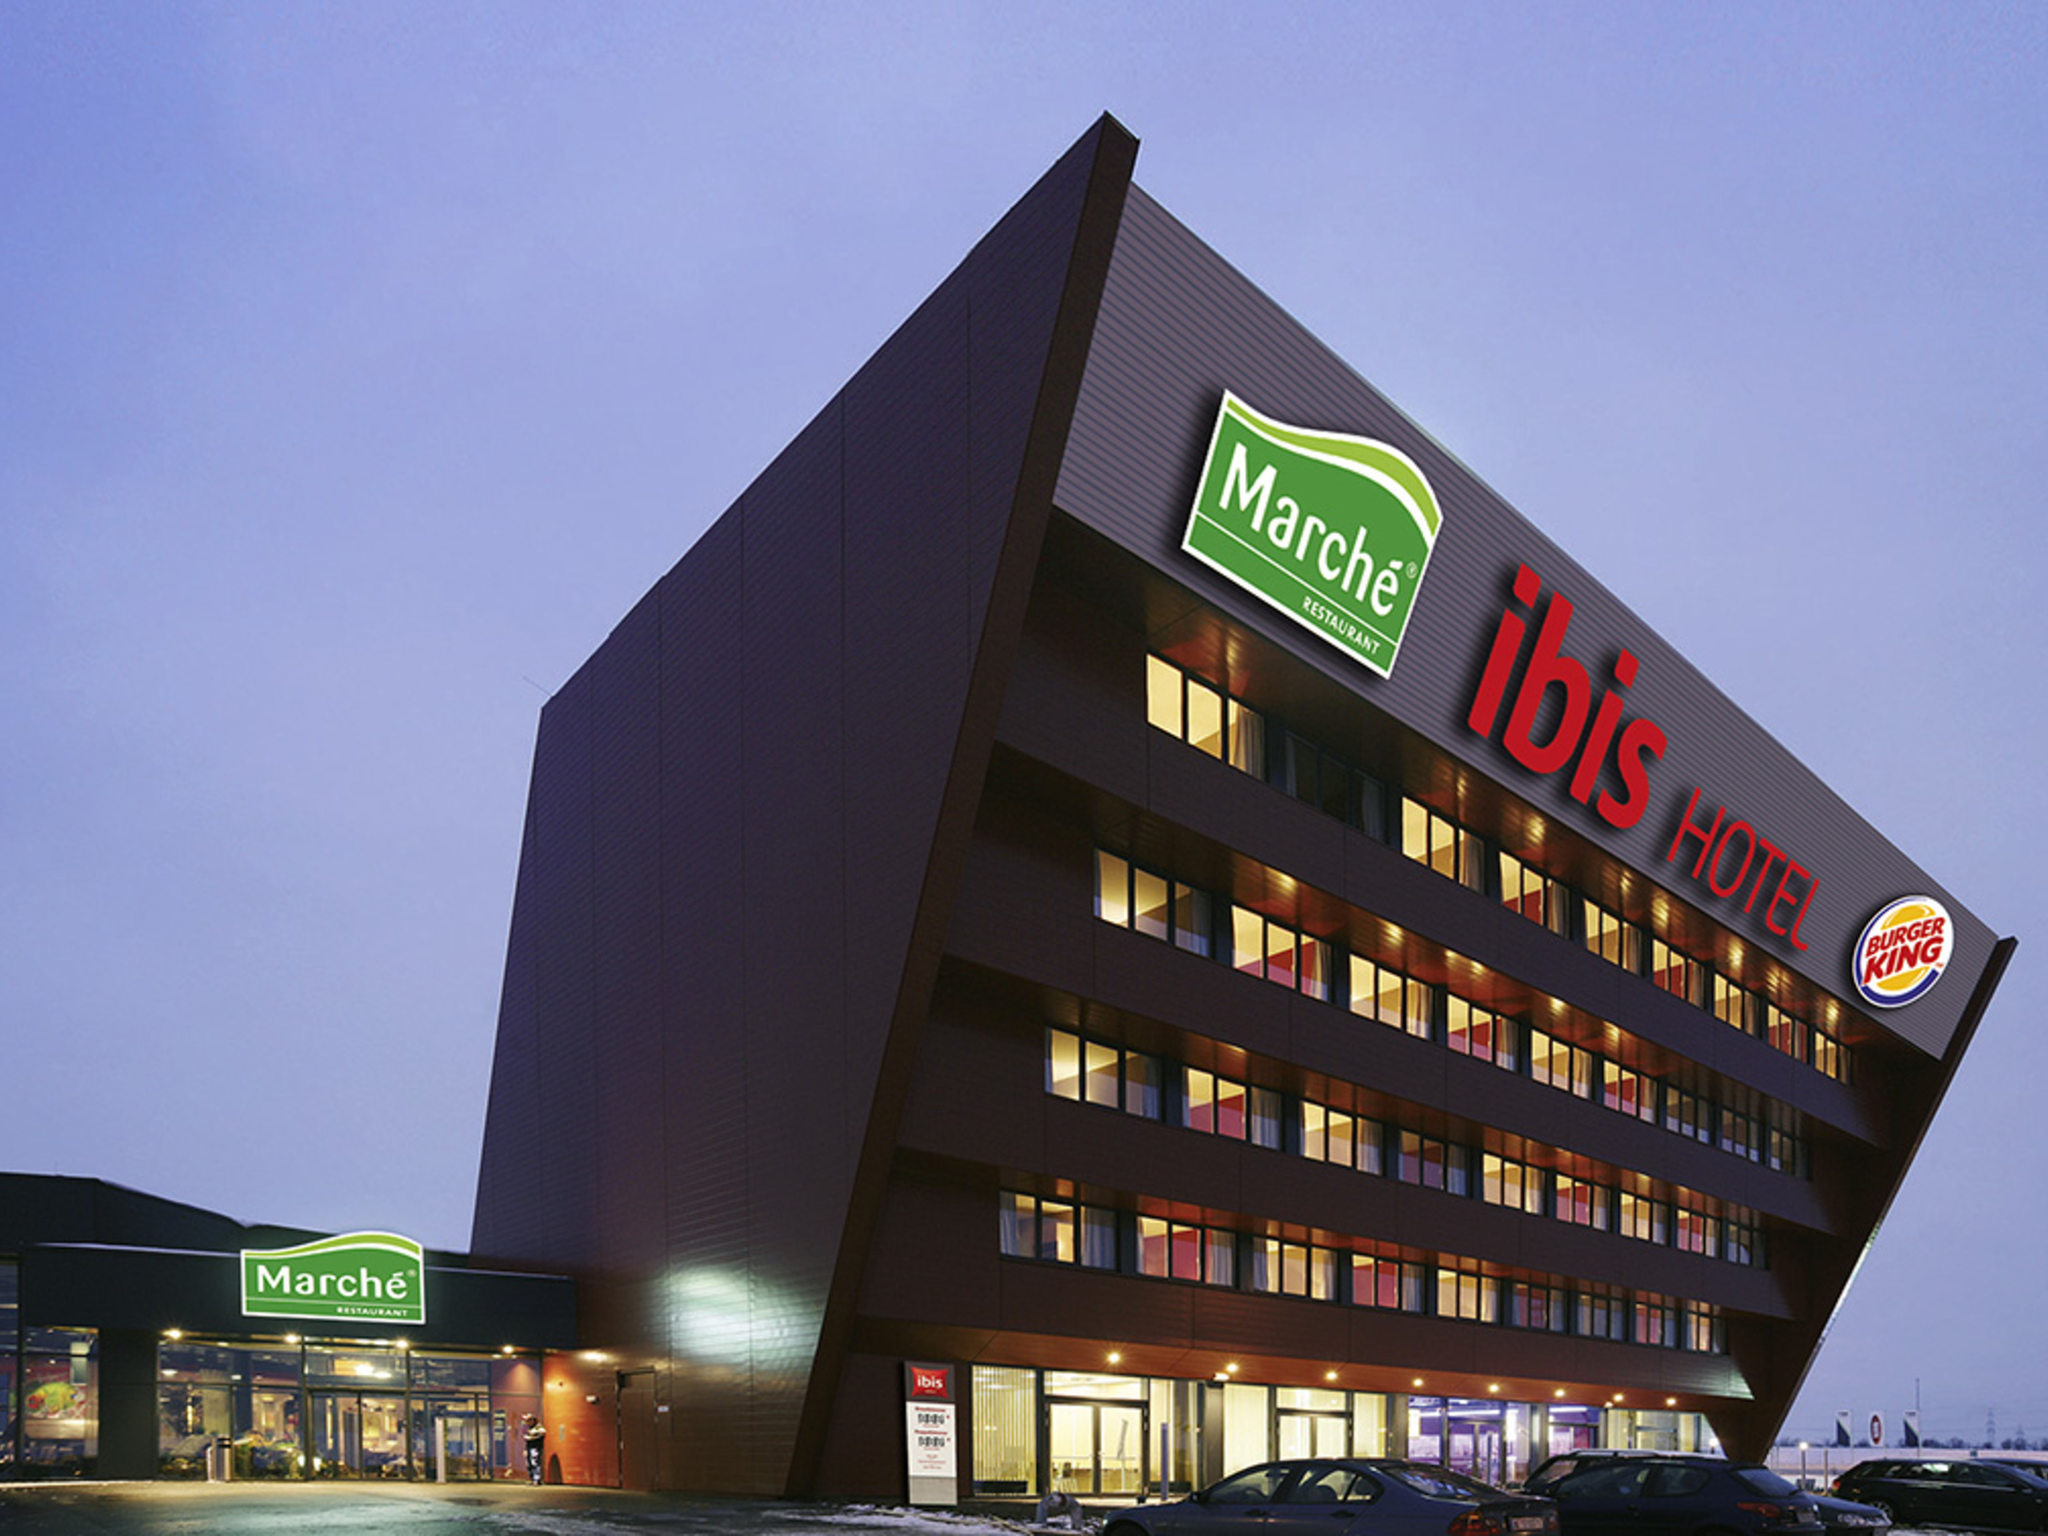 Hotel Wien Schwechat